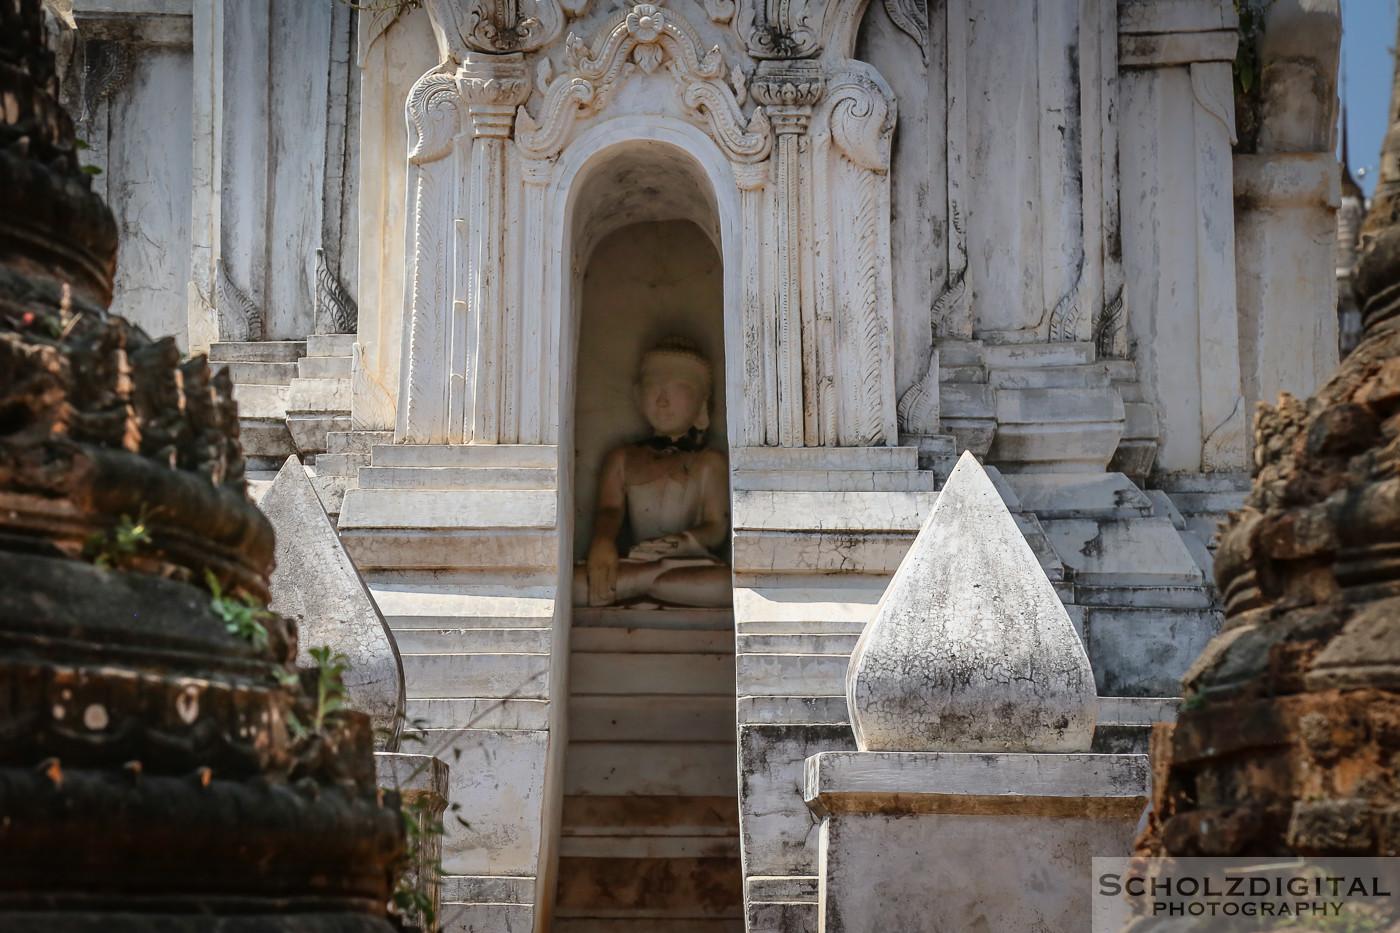 Abandoned, Birma, Burma, Lost Place, Myanmar, Nyaung Oak Monastery, Travelling, Urban exploration, Urbex, verlassen, Verlassene Orte, verlaten